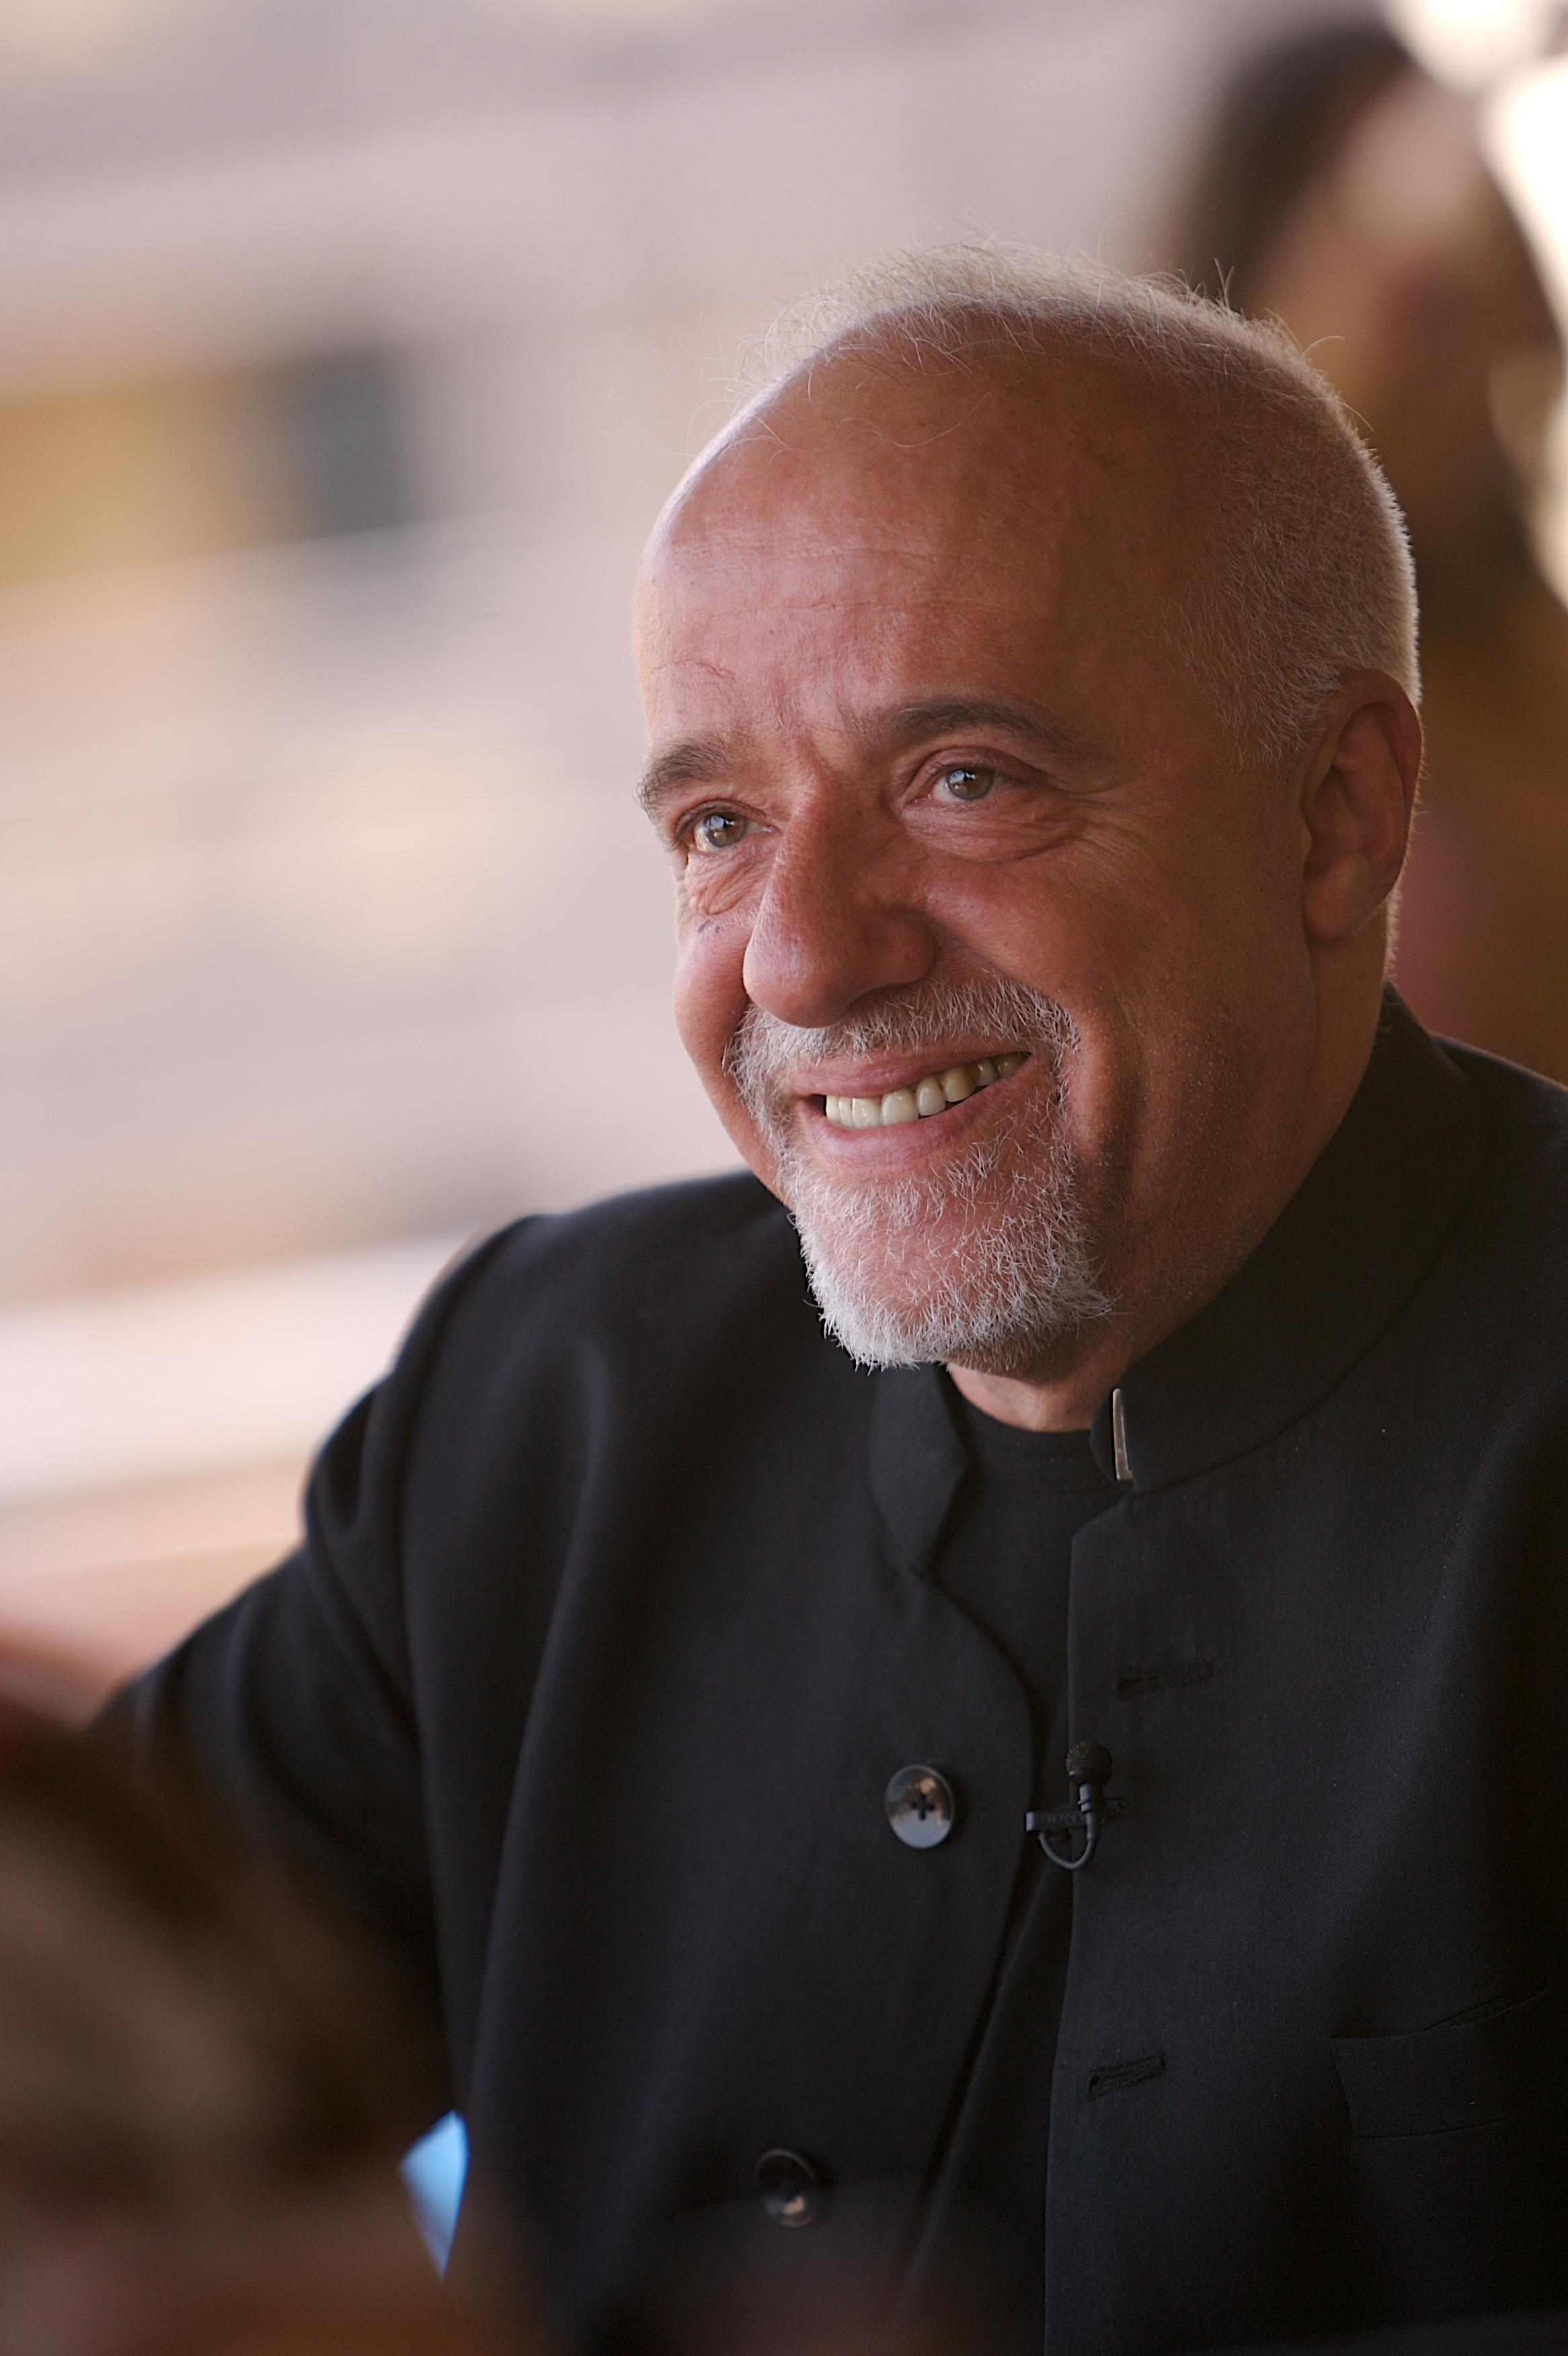 Paulo Coelho photo #0